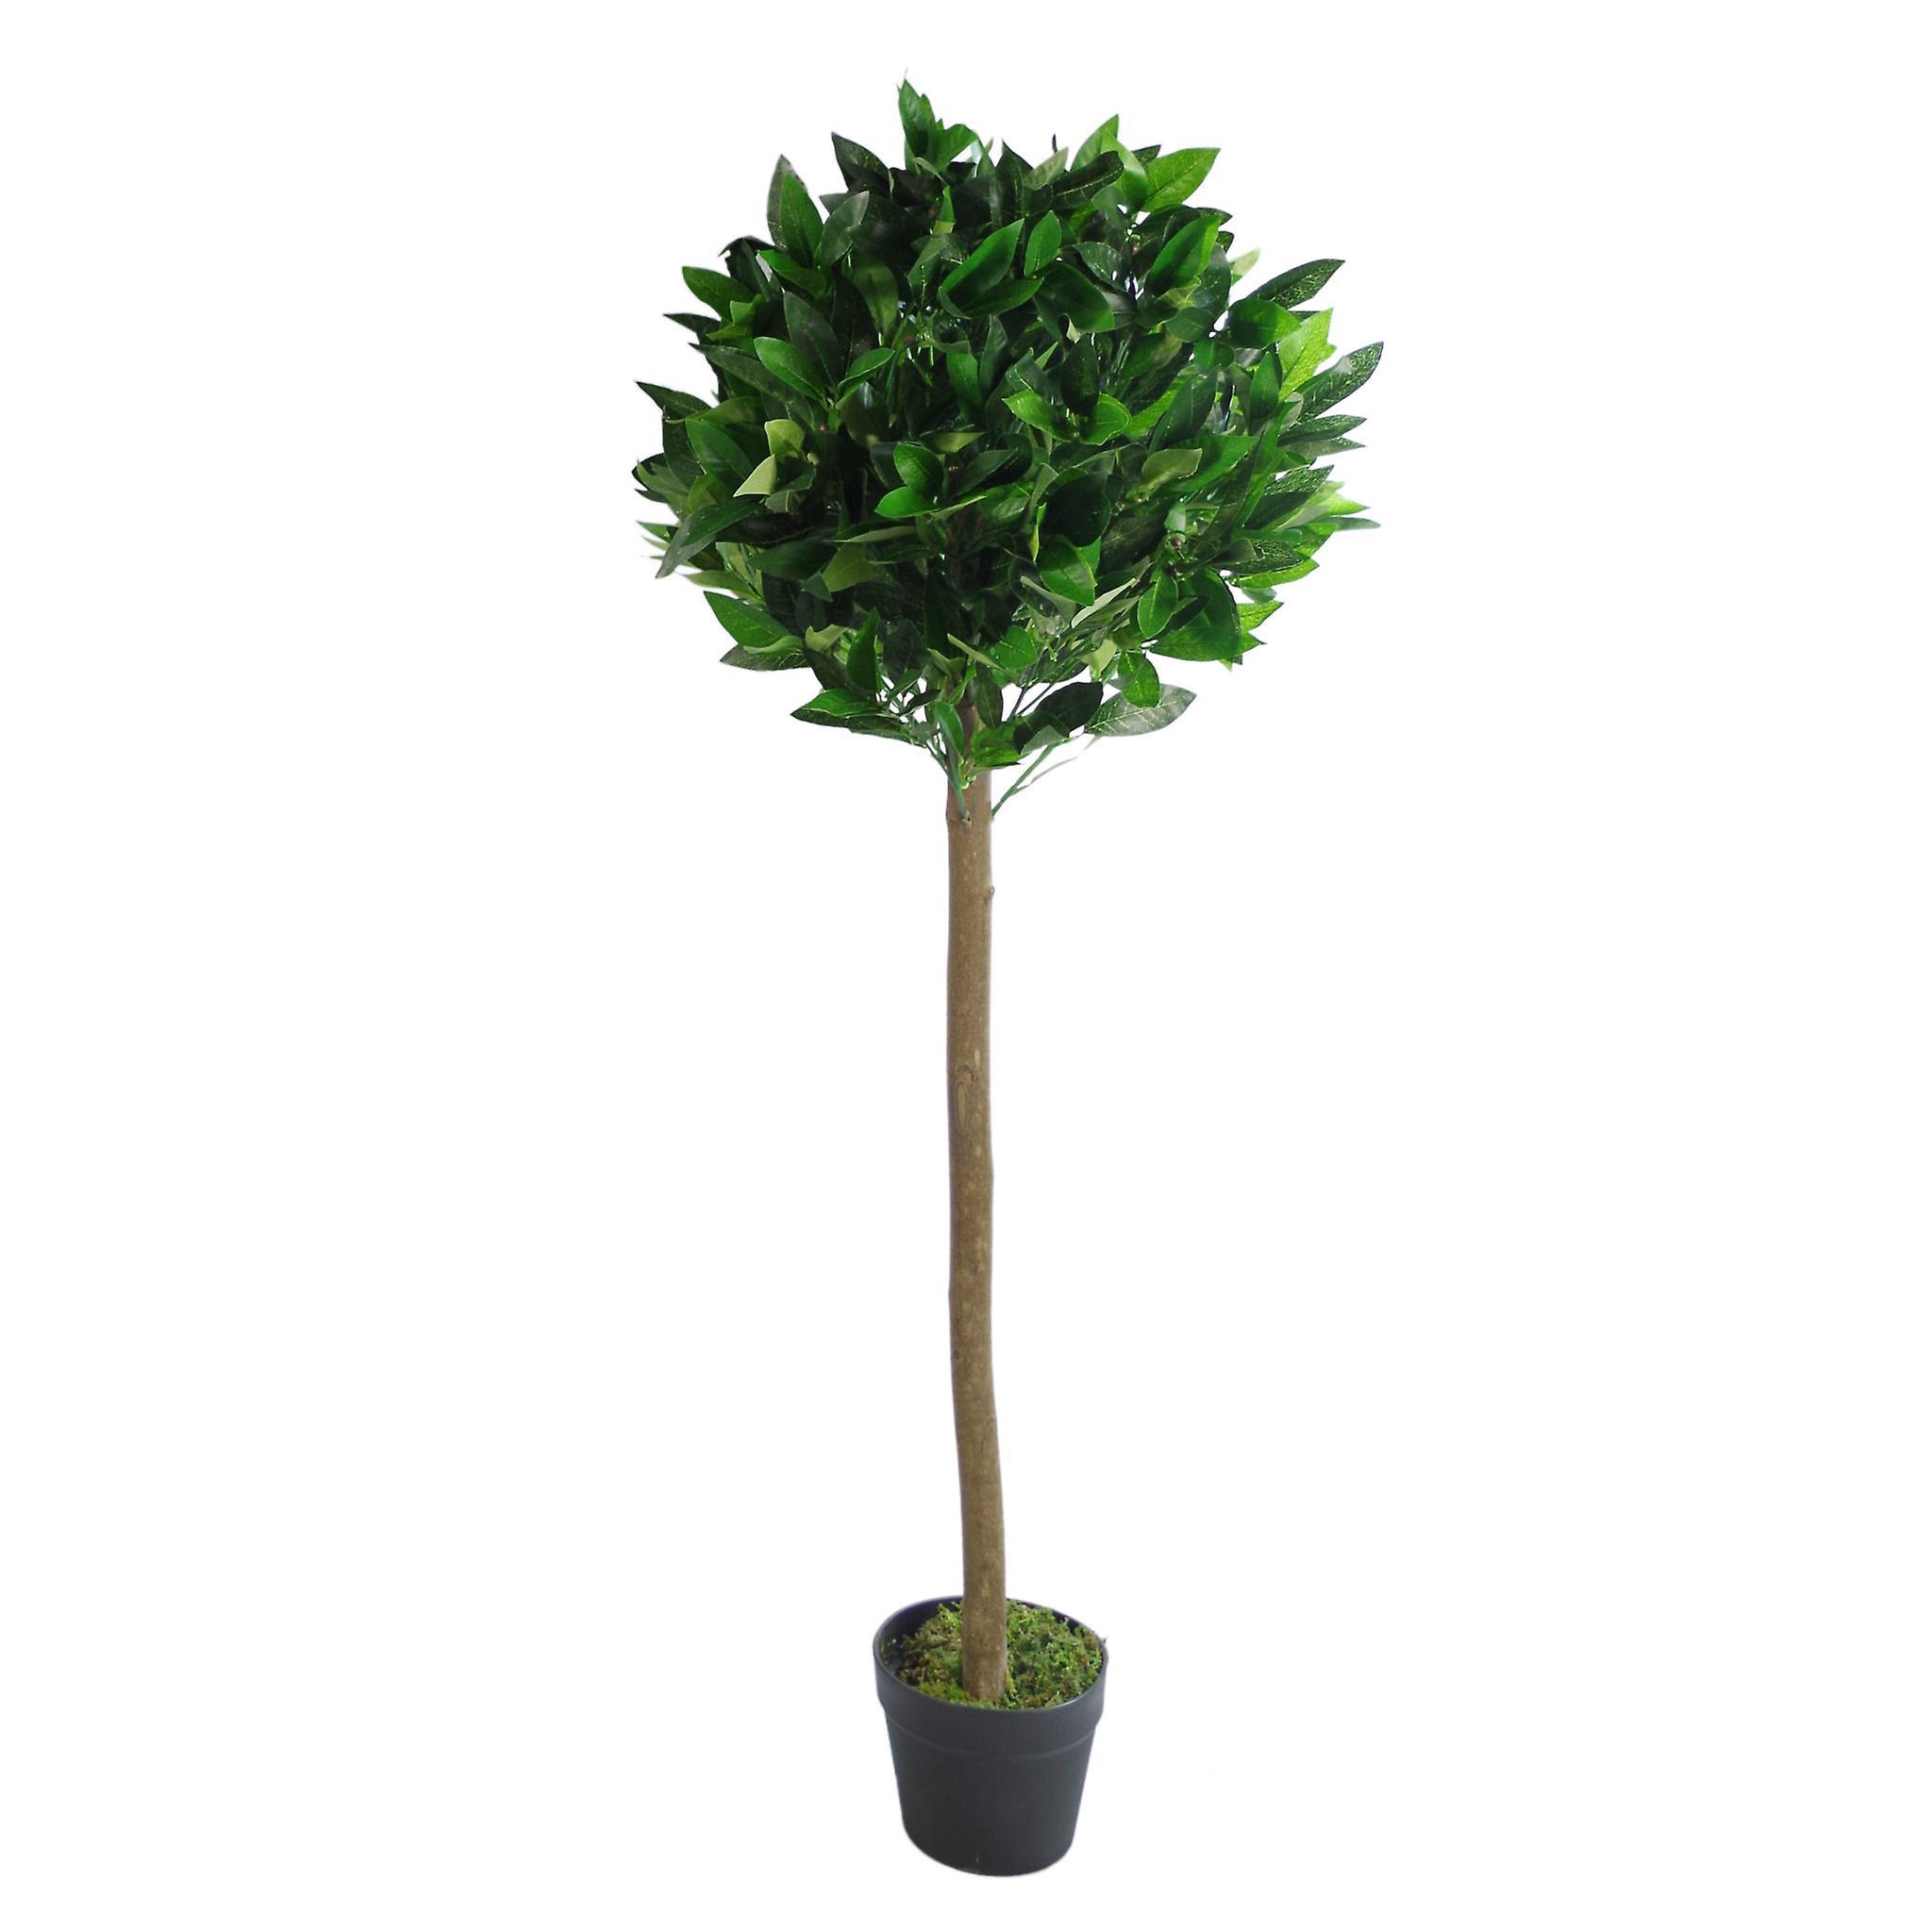 120cm (4ft) Plain Natural Trunk Artificial Topiary Bay Laurel Ball Tree